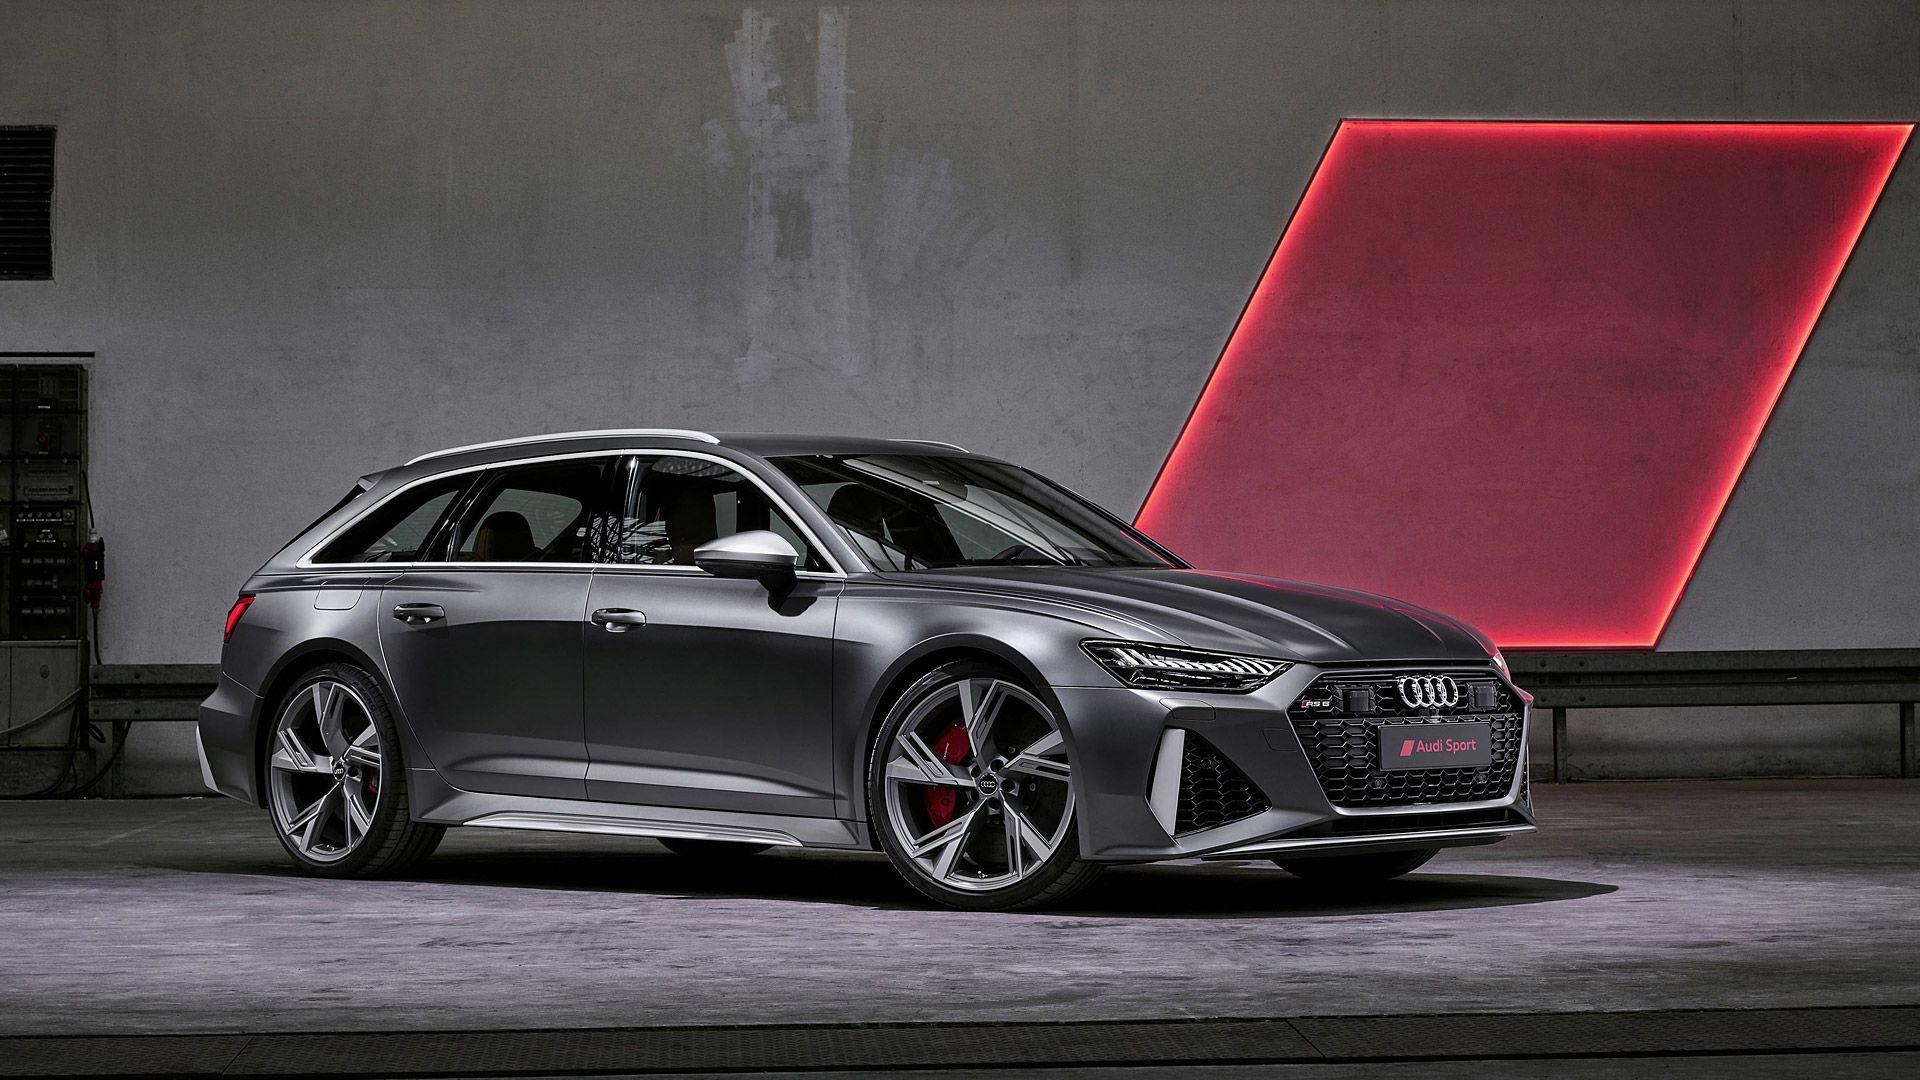 Audi Rs6 Avant Wallpapers Top Free Audi Rs6 Avant Backgrounds Wallpaperaccess